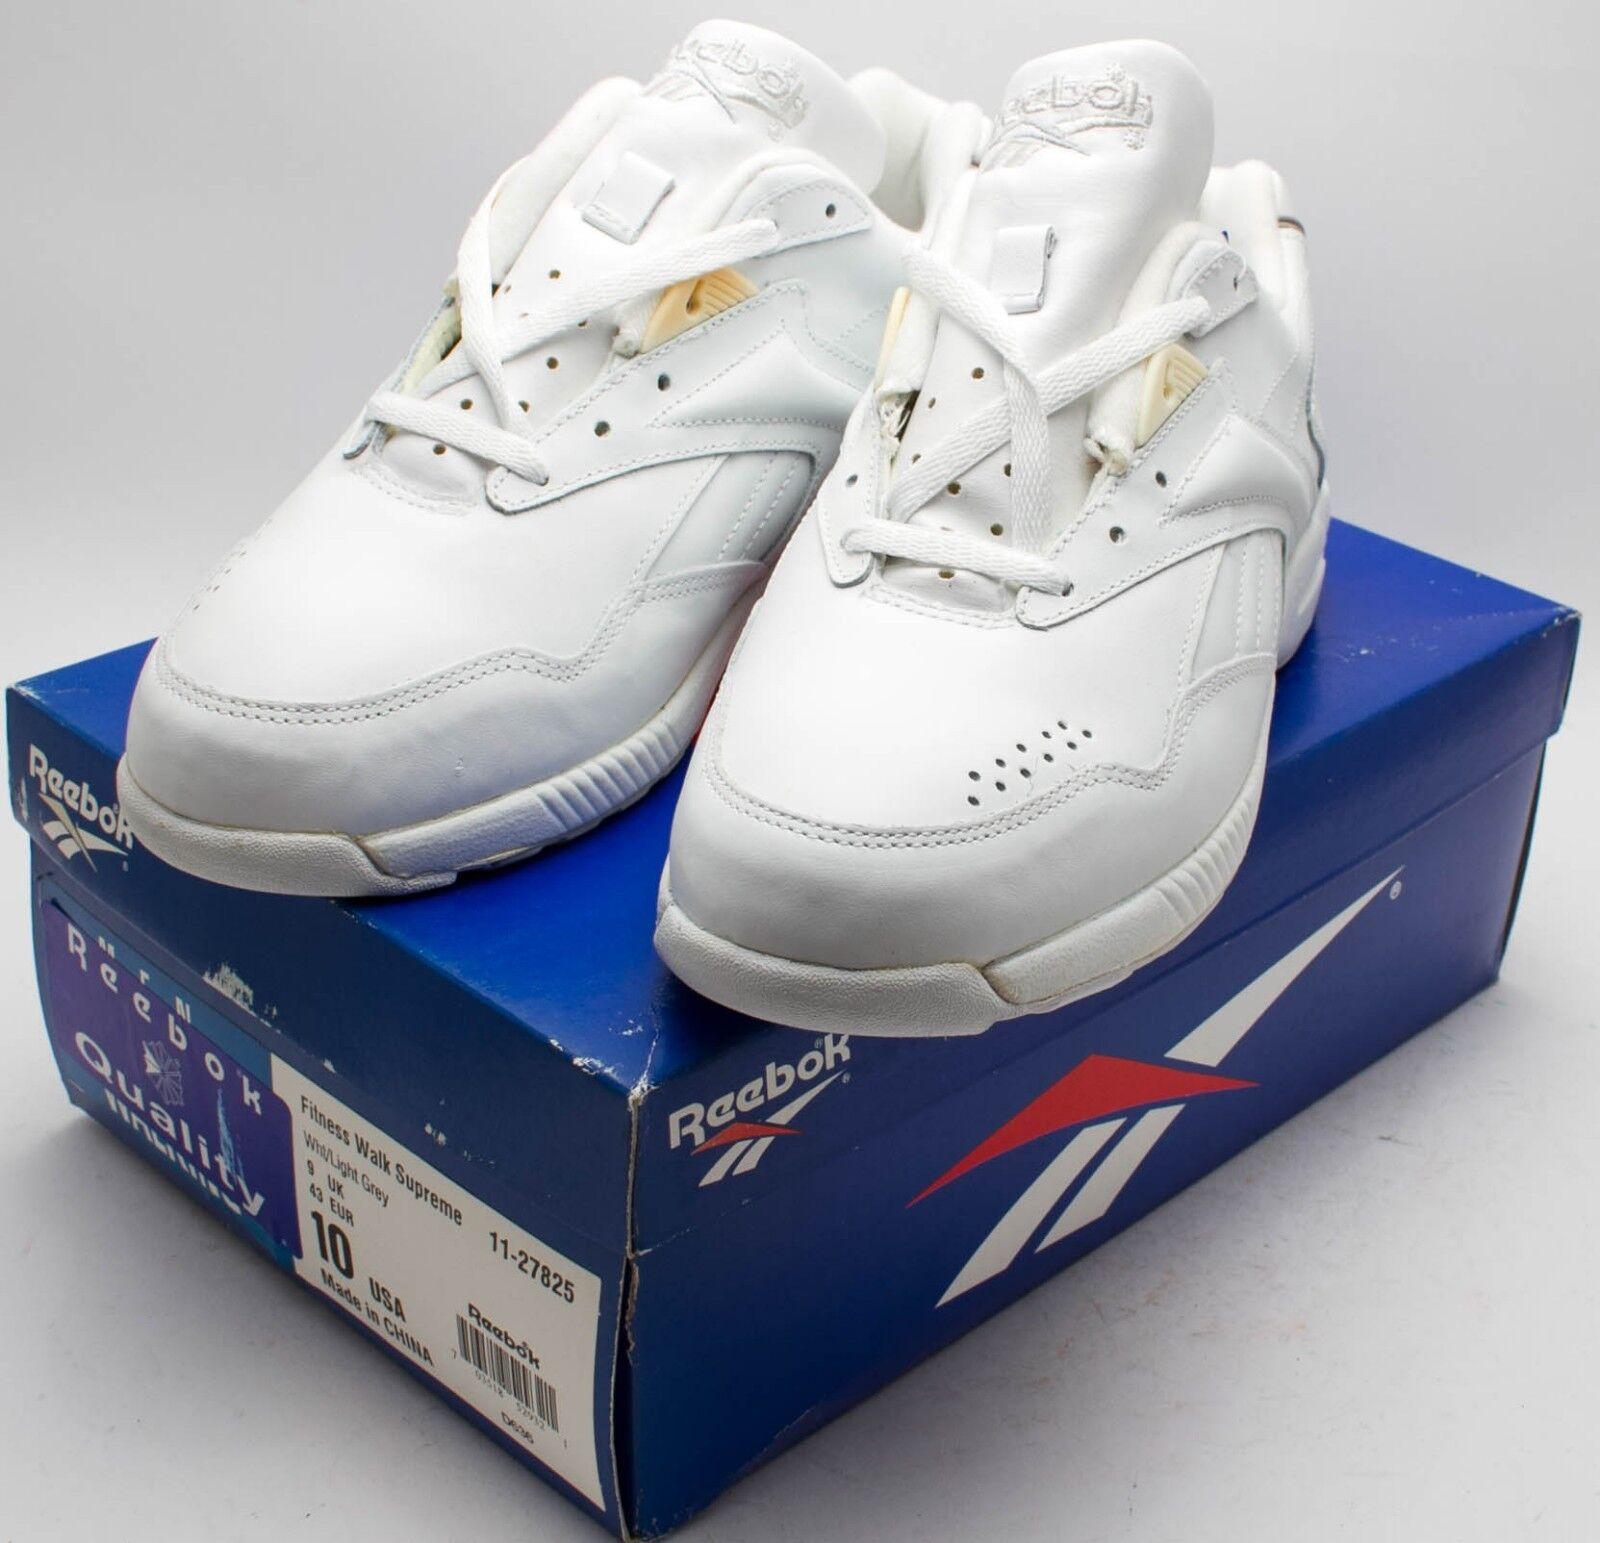 Reebok Hommes Vintage 1993 Fitness Walk Supreme Chaussures 11-27825 Blanc Taille 10